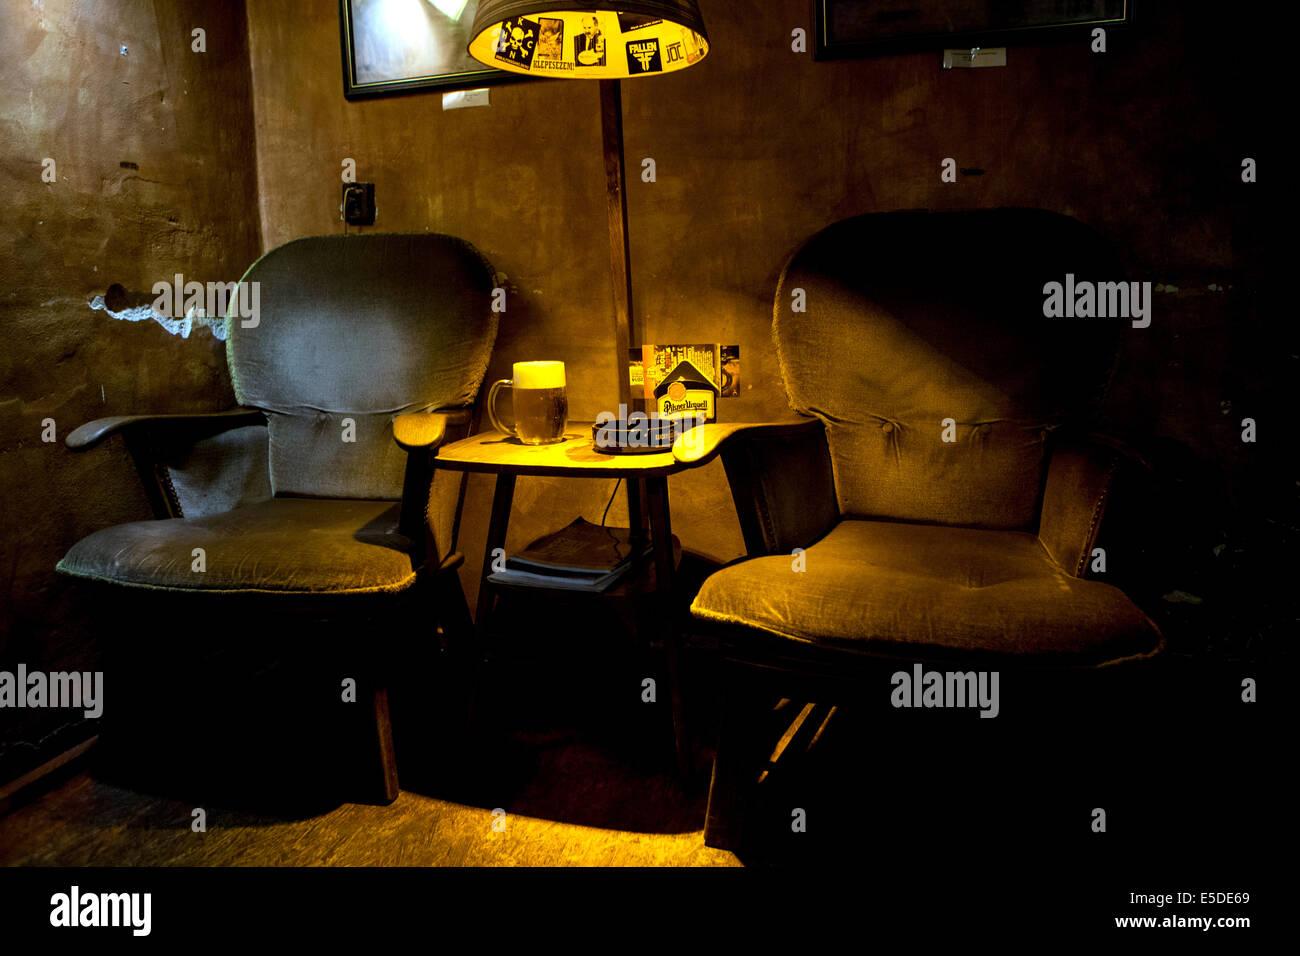 bar Znama firma, atmosphere with lamp and beer, Zizkov, Prague, Czech Republic - Stock Image